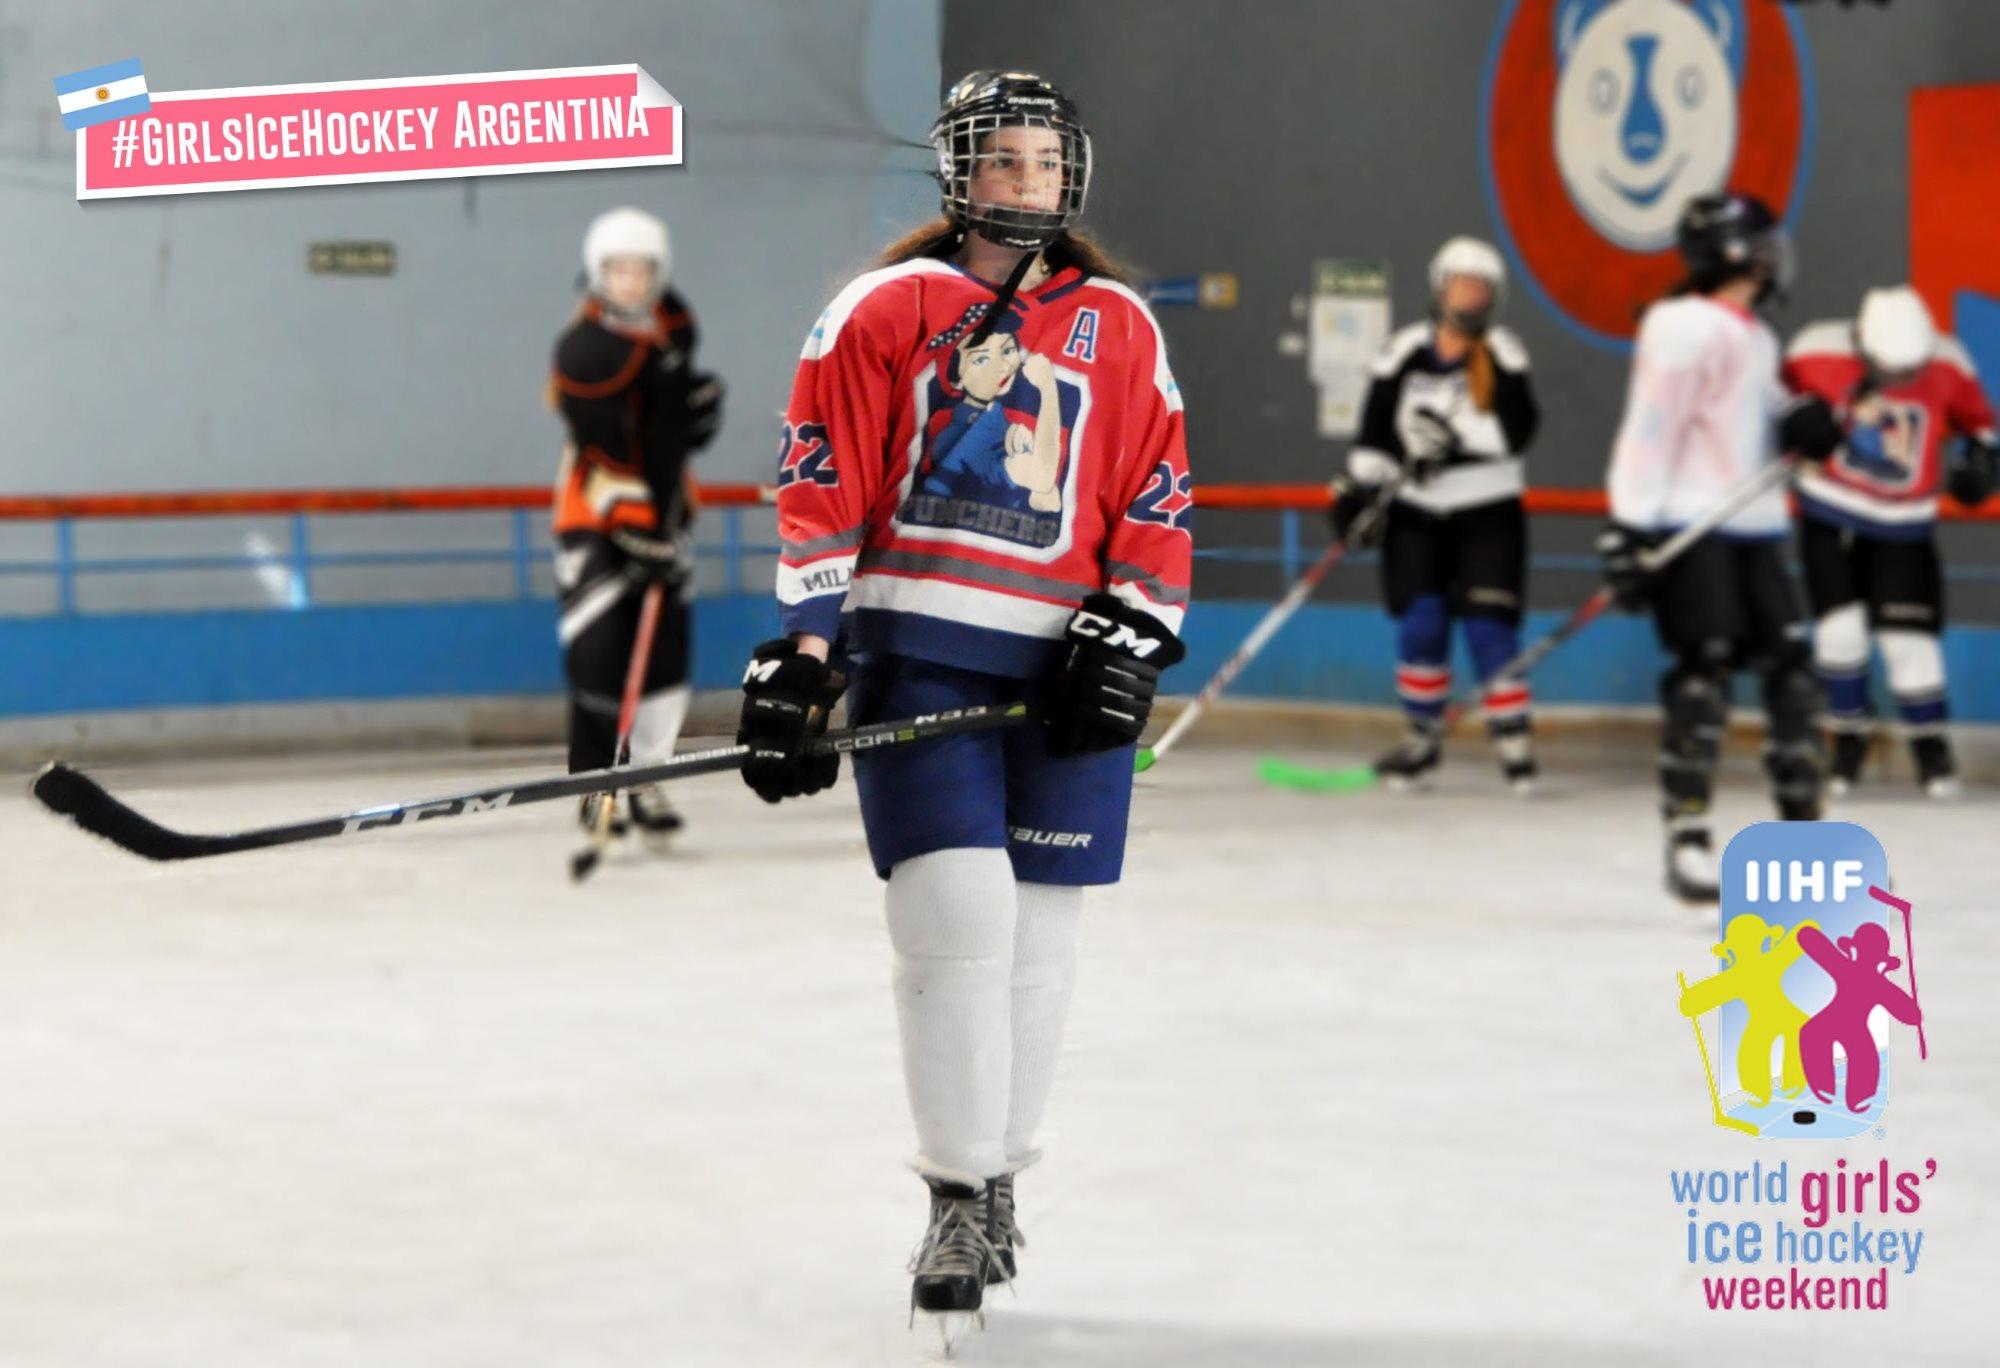 9d1980a8293 Chinese Taipei  Taipei City. The World Girls  Ice Hockey ...